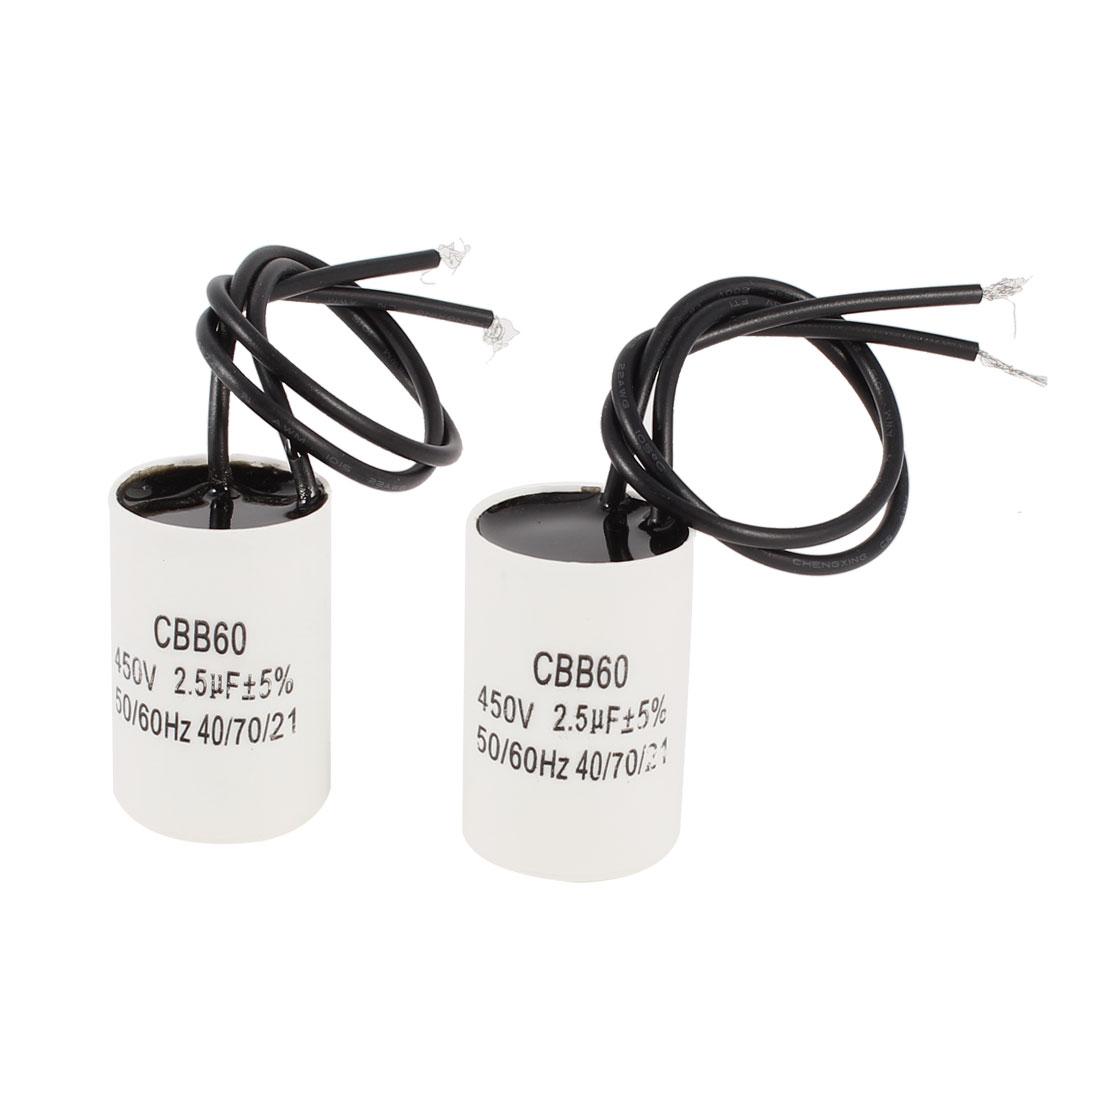 CBB60 AC 450V 2.5uF 50/60Hz Cylinder Shape Non Polar Motor Capacitor 2pcs